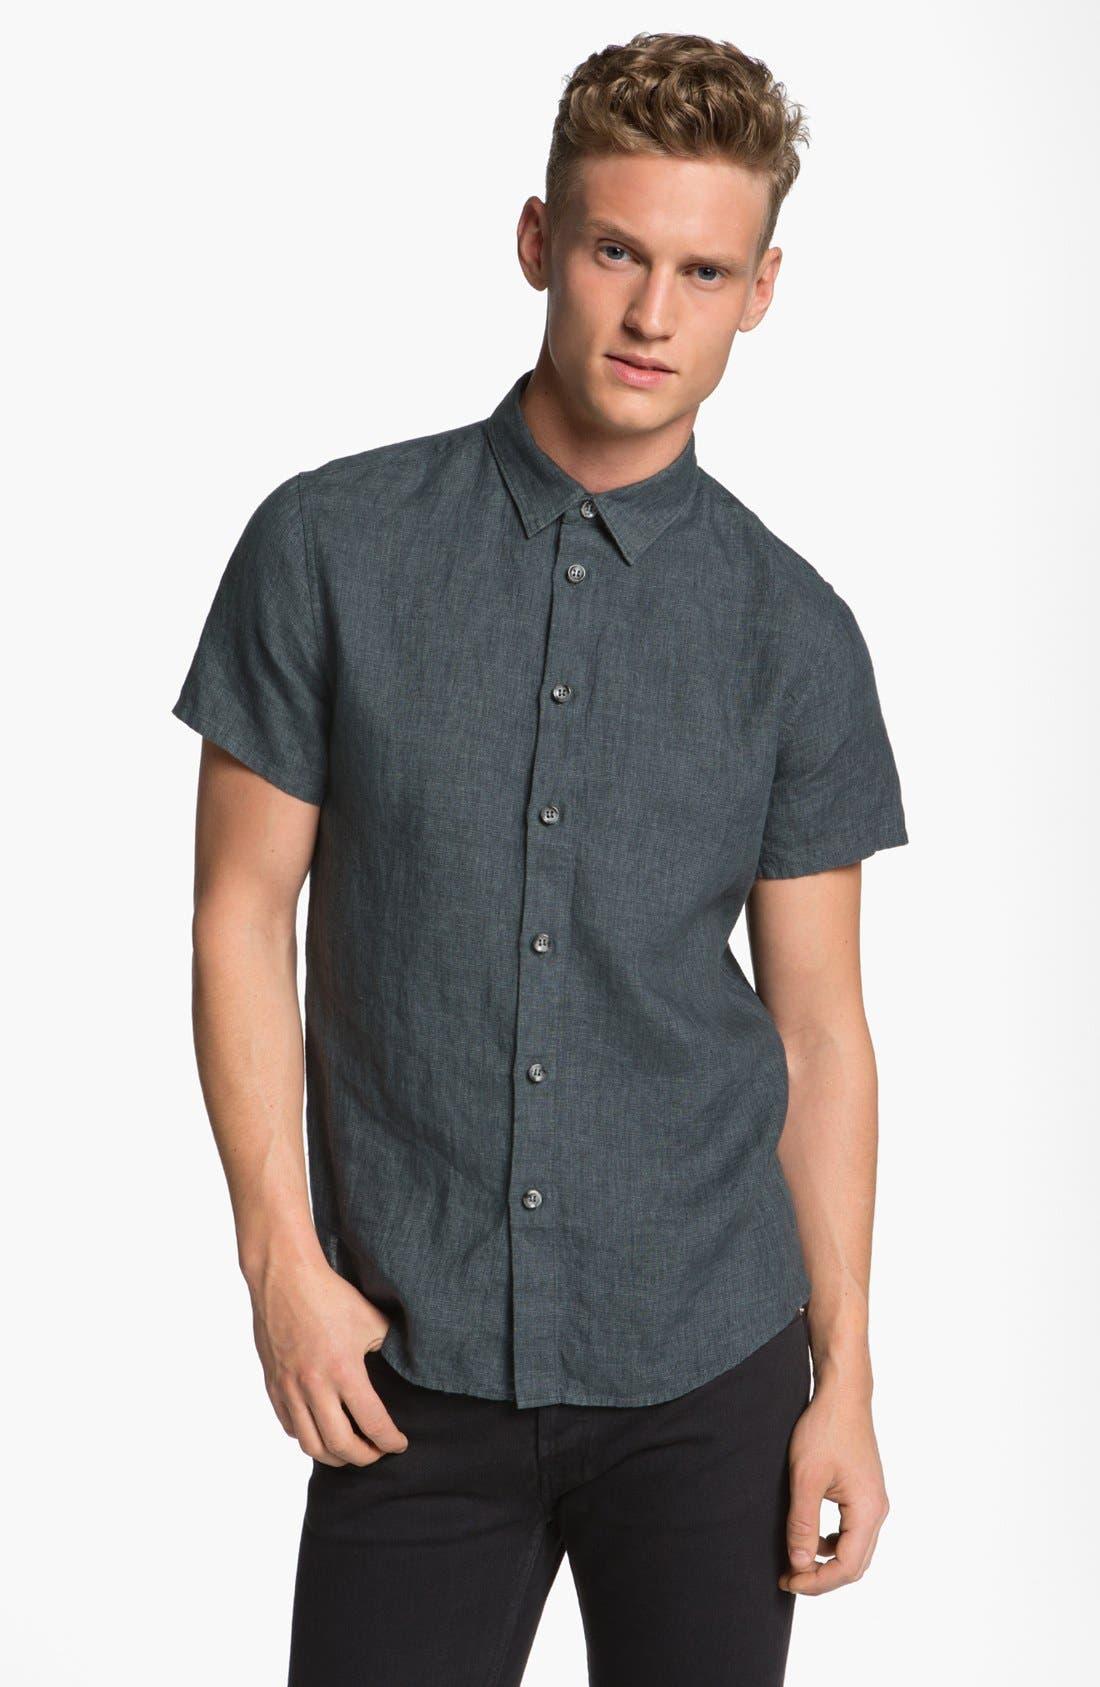 Alternate Image 1 Selected - A.P.C. 'Ernest' Short Sleeve Linen Shirt